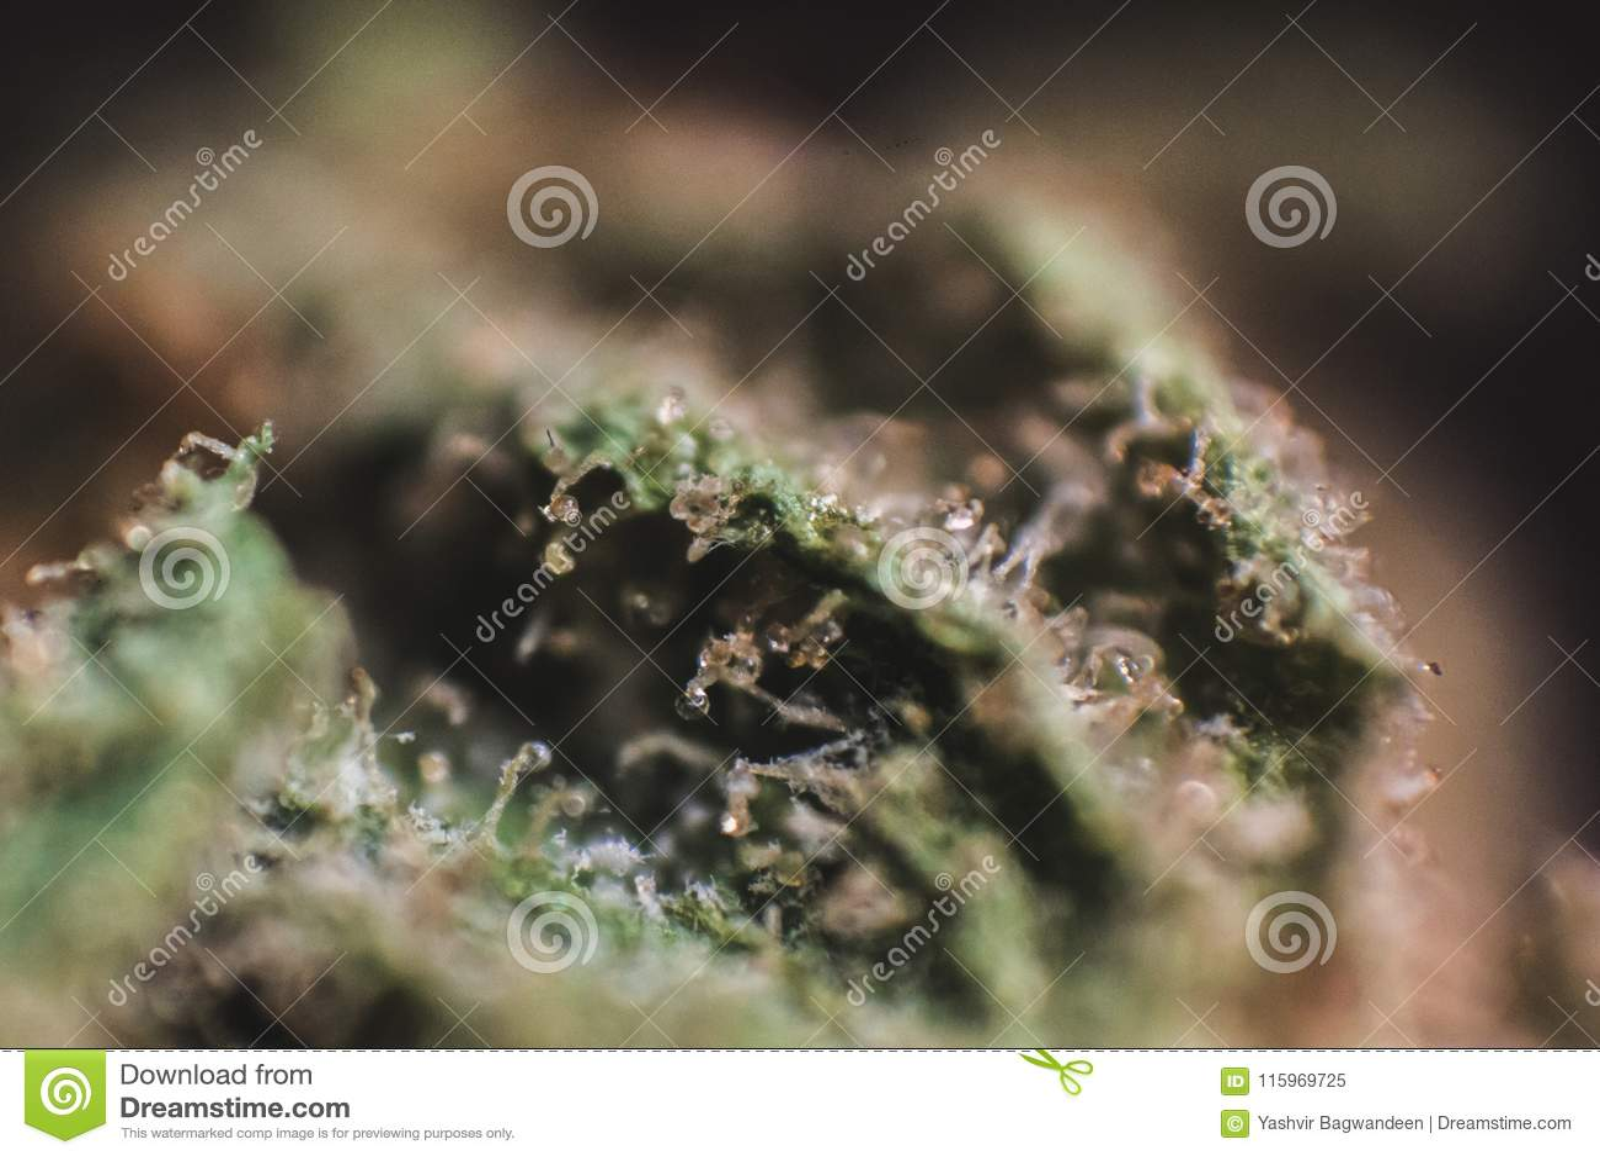 Medical Marijuana, Cannabis, Sativa, Indica, Trichomes, THC, CBD